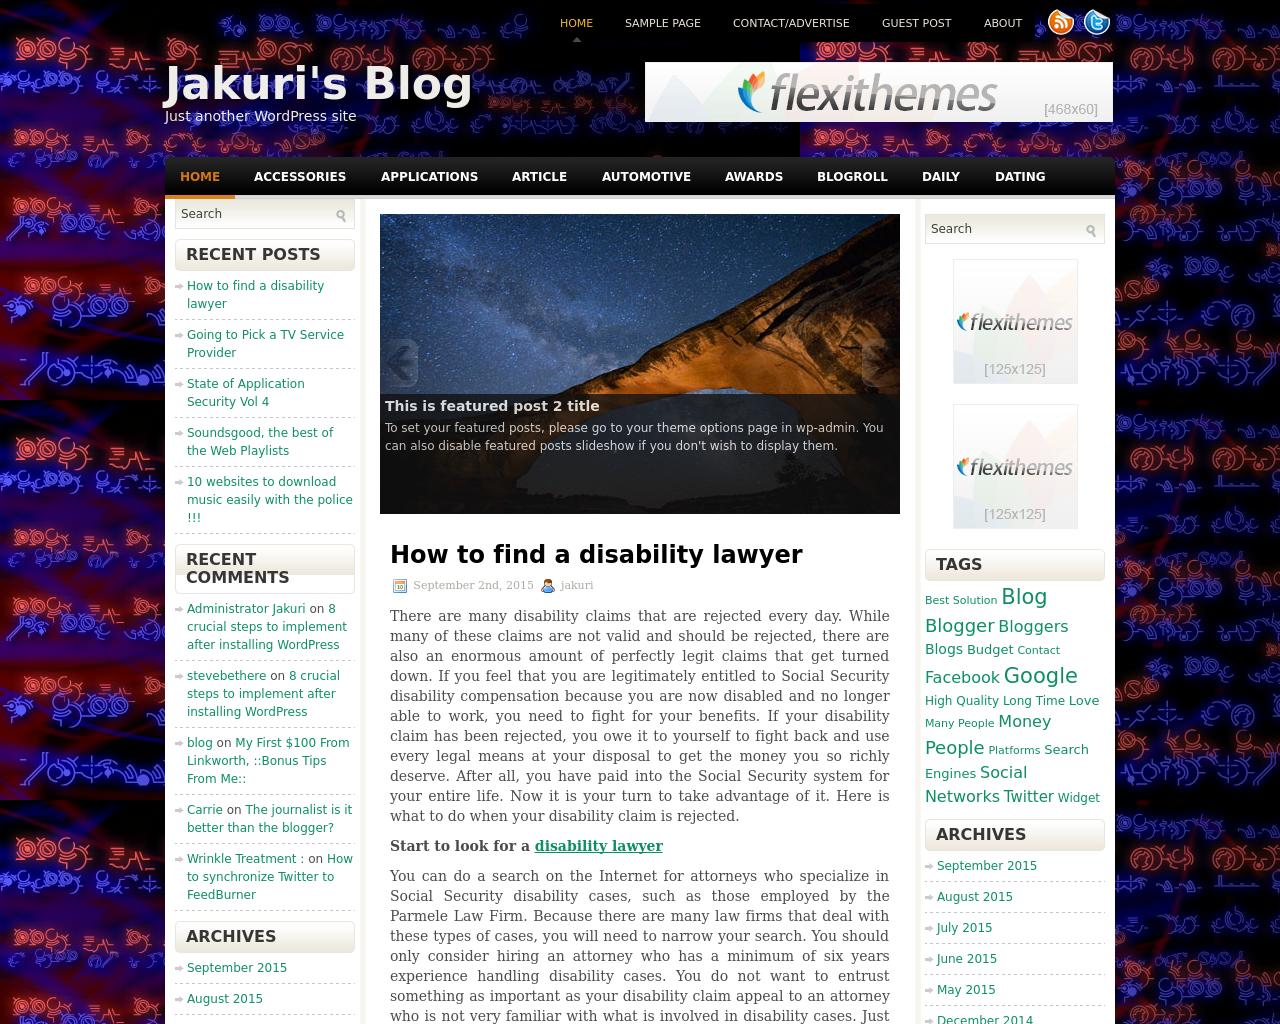 Jakuri's-Blog-Advertising-Reviews-Pricing